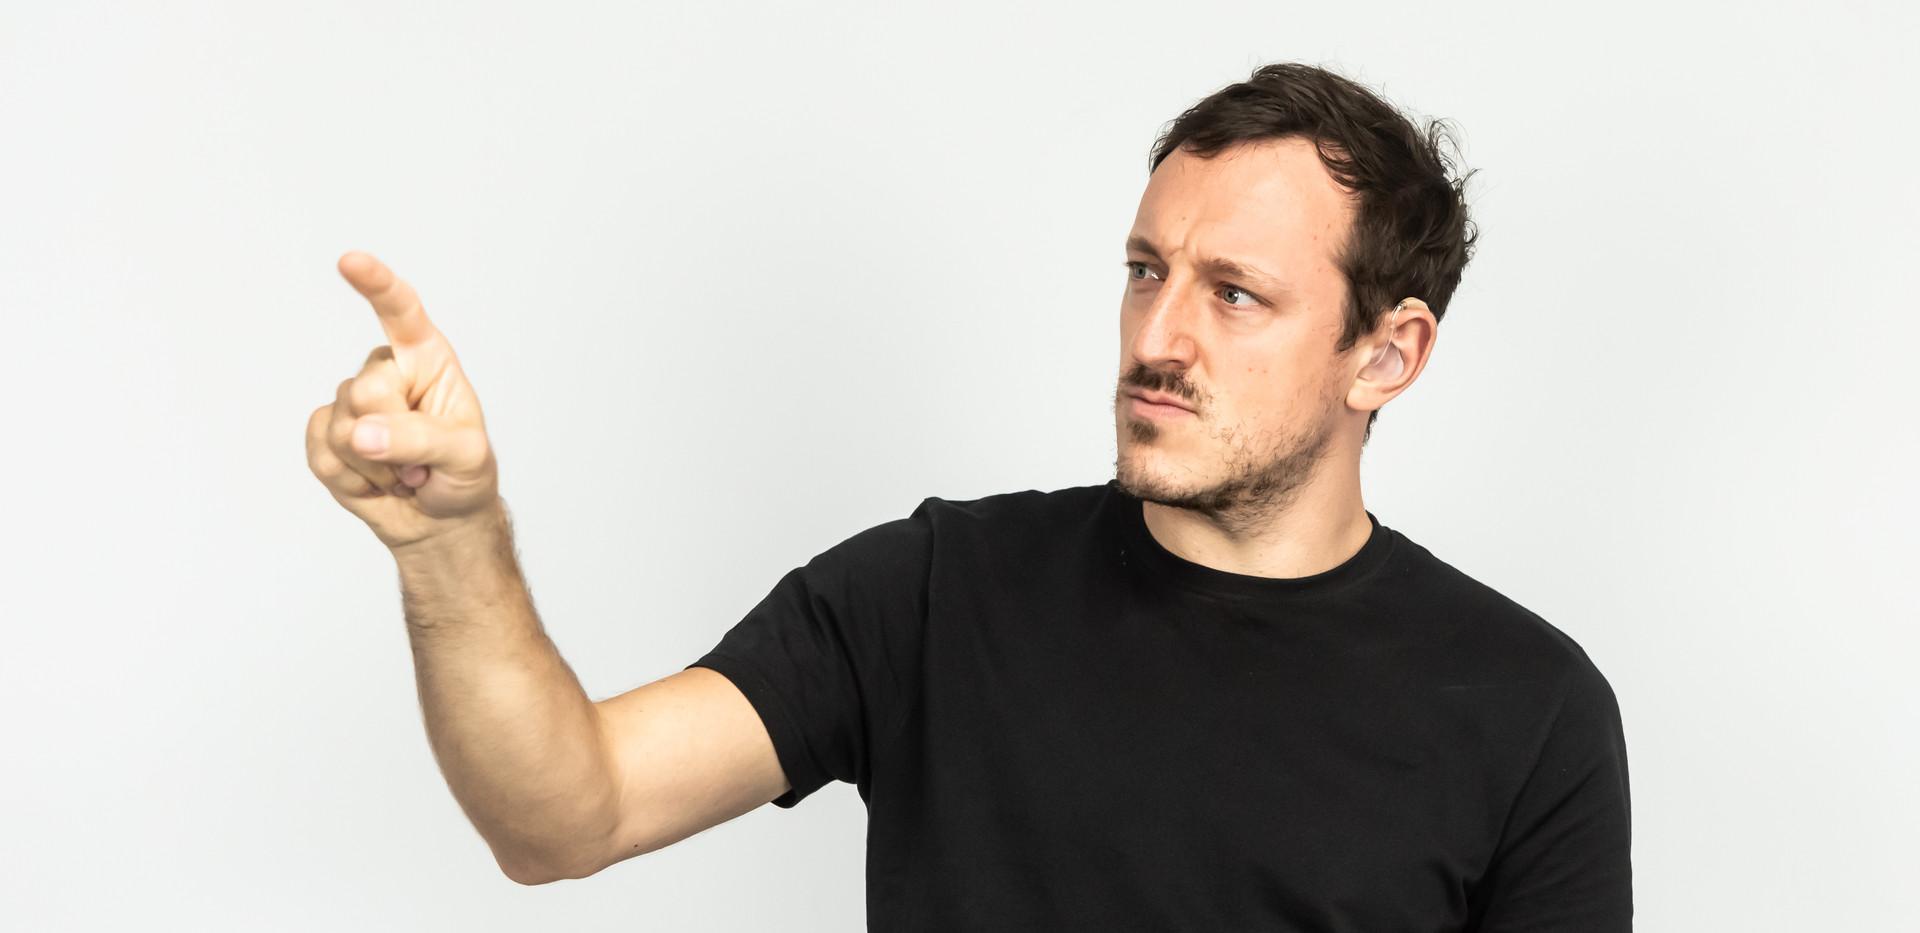 DeafAwakening